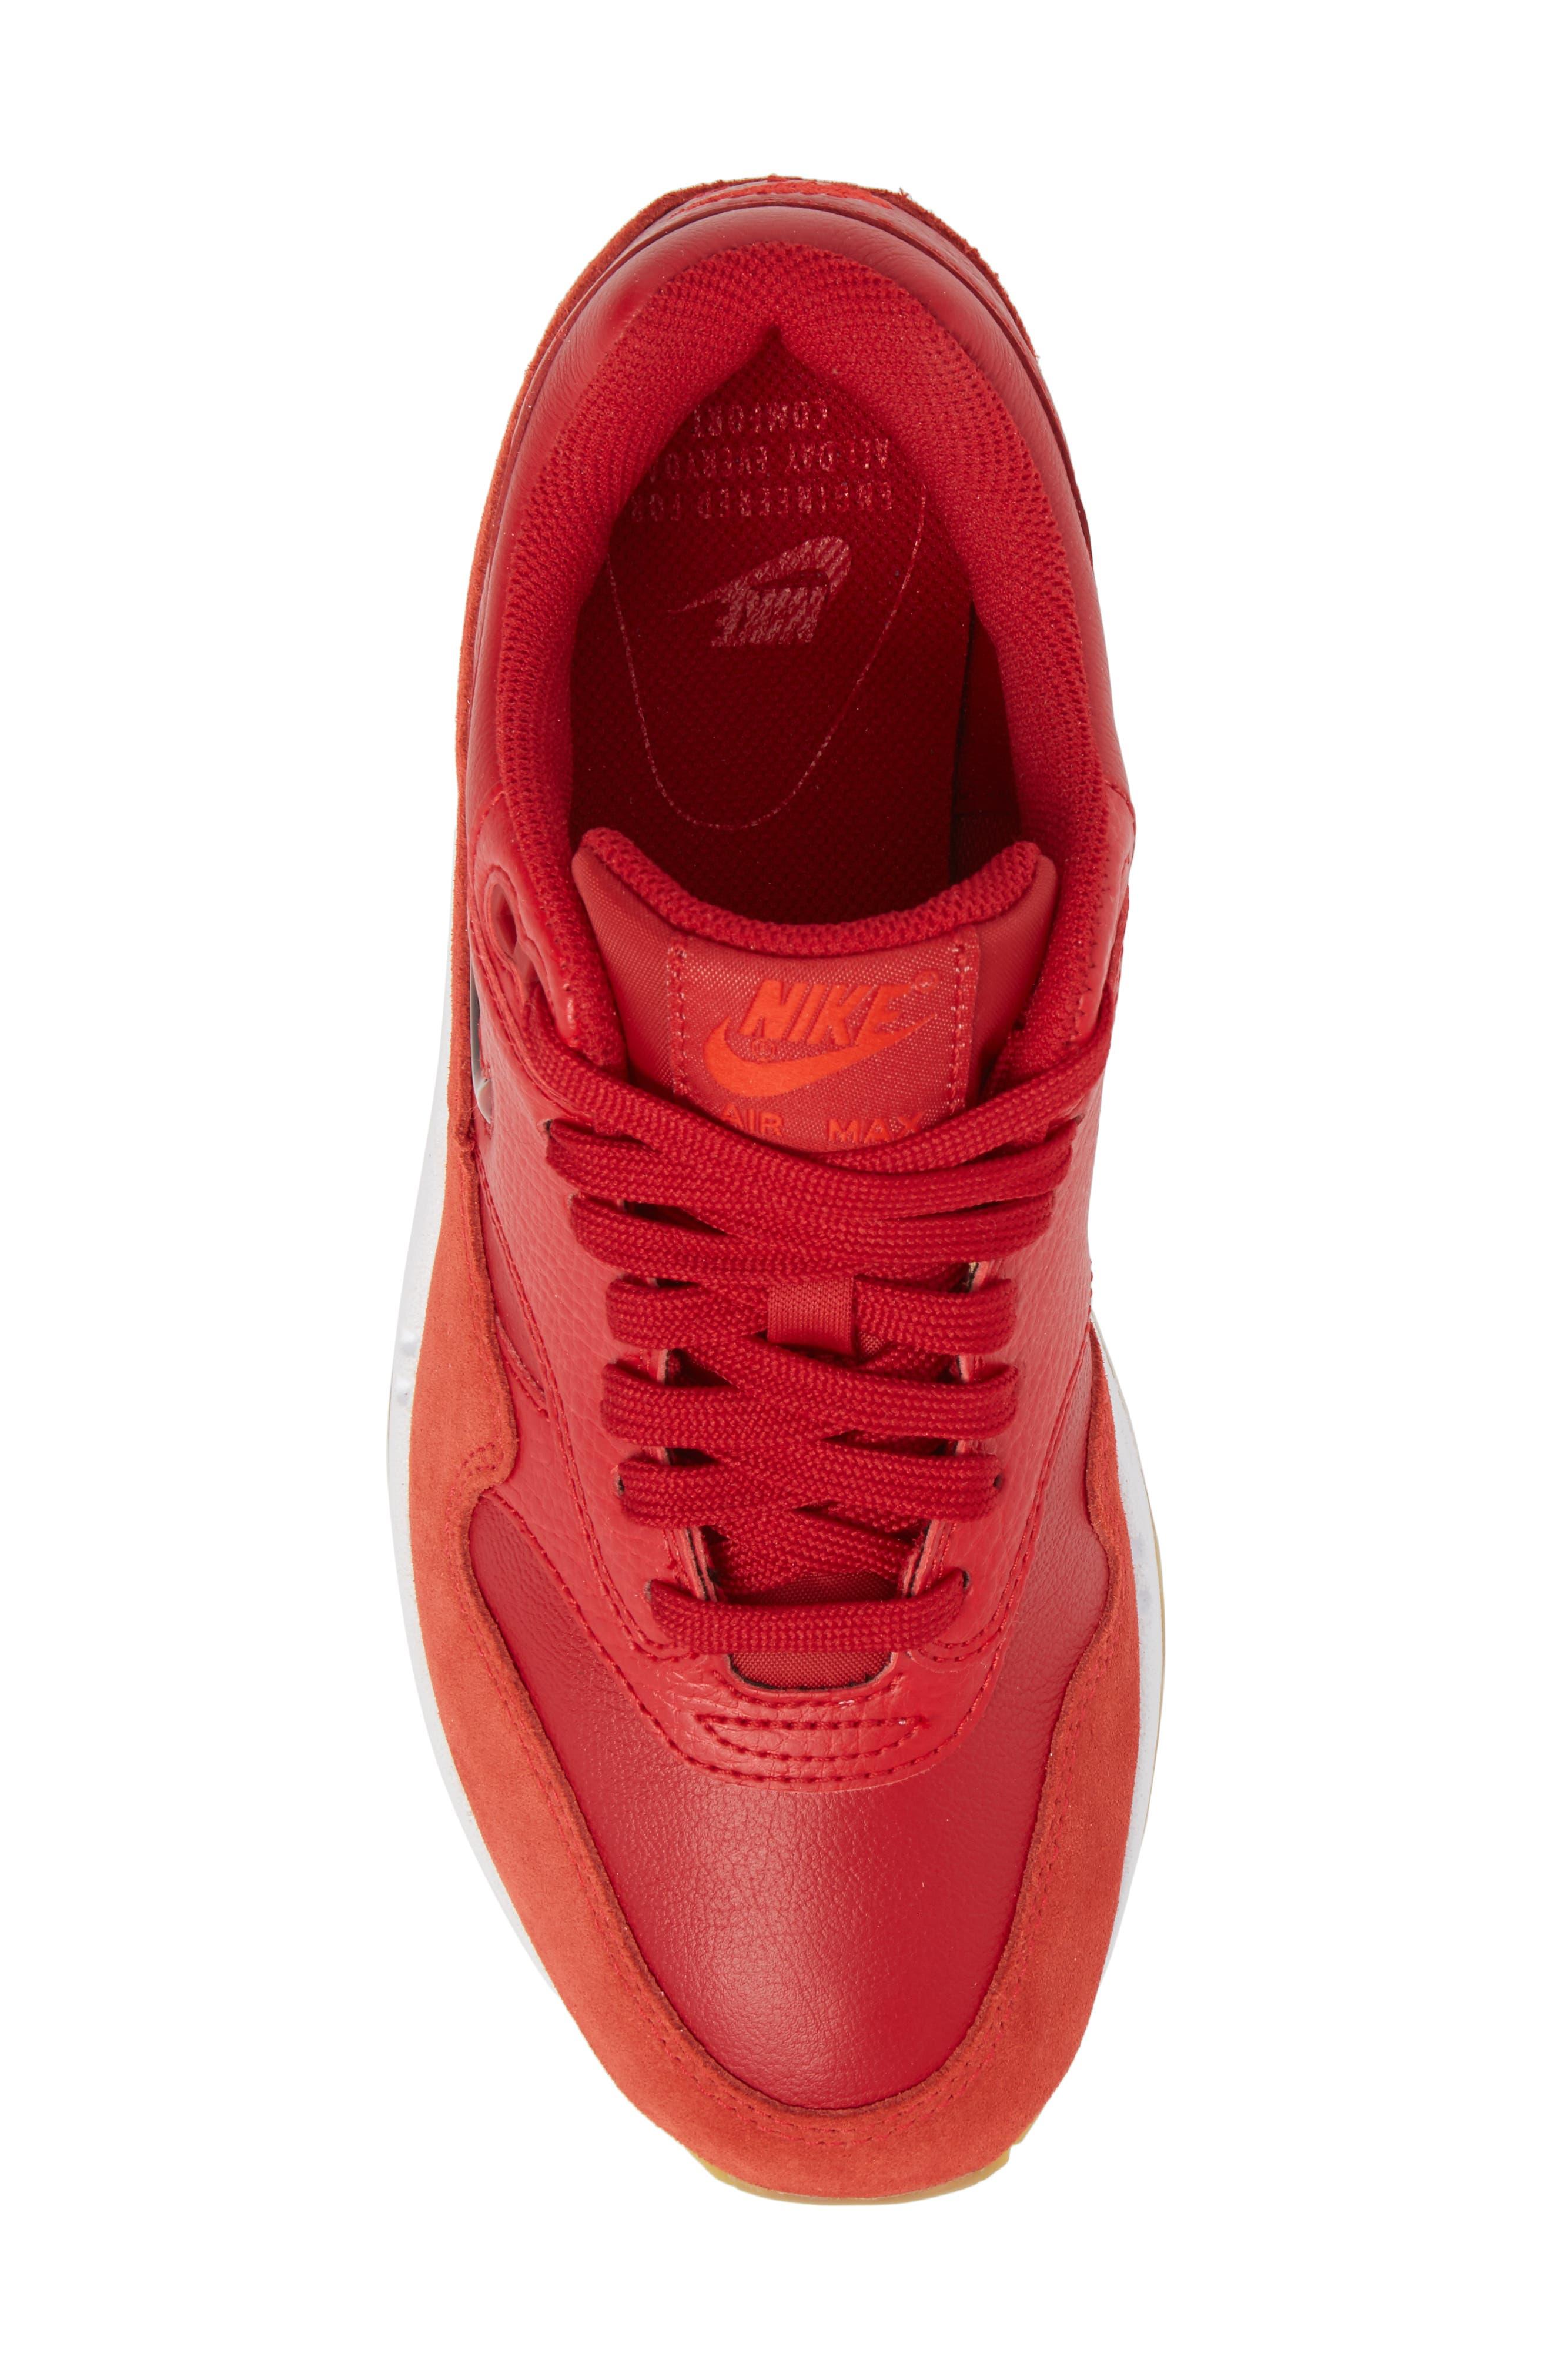 Air Max 1 Premium SC Sneaker,                             Alternate thumbnail 6, color,                             Gym Red/ Gym Red